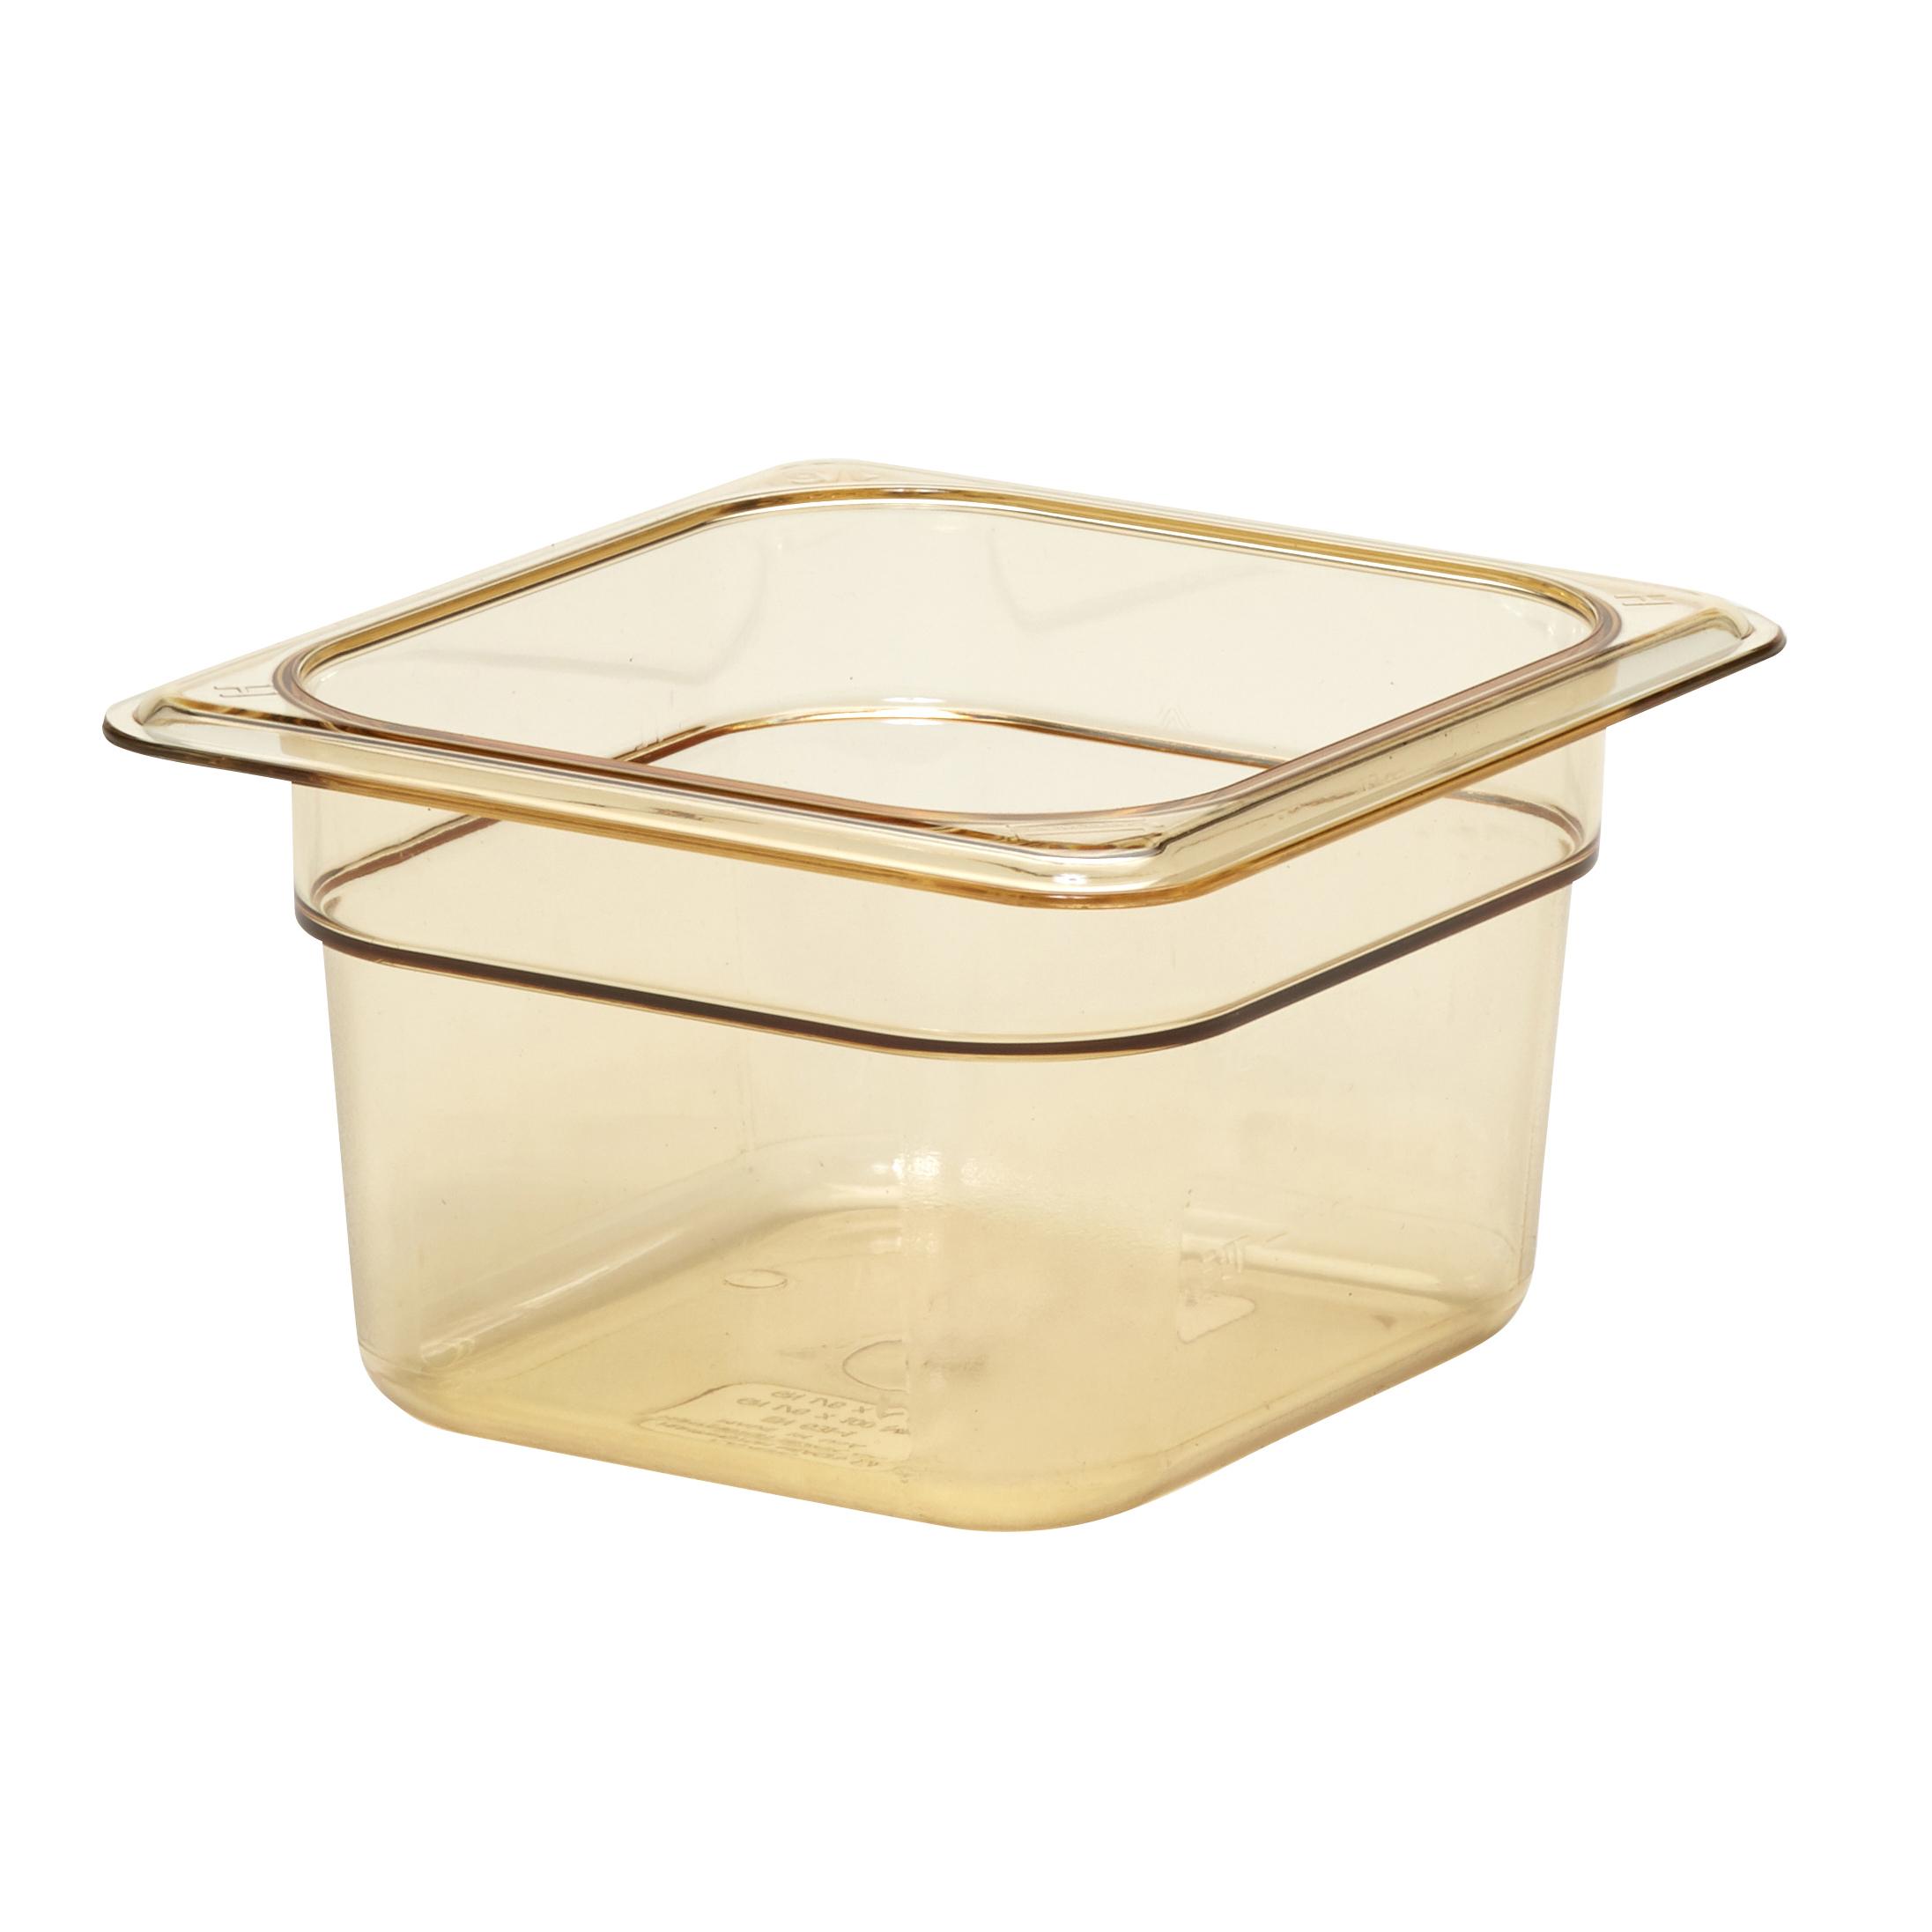 Cambro 64HP150 food/beverage storage container